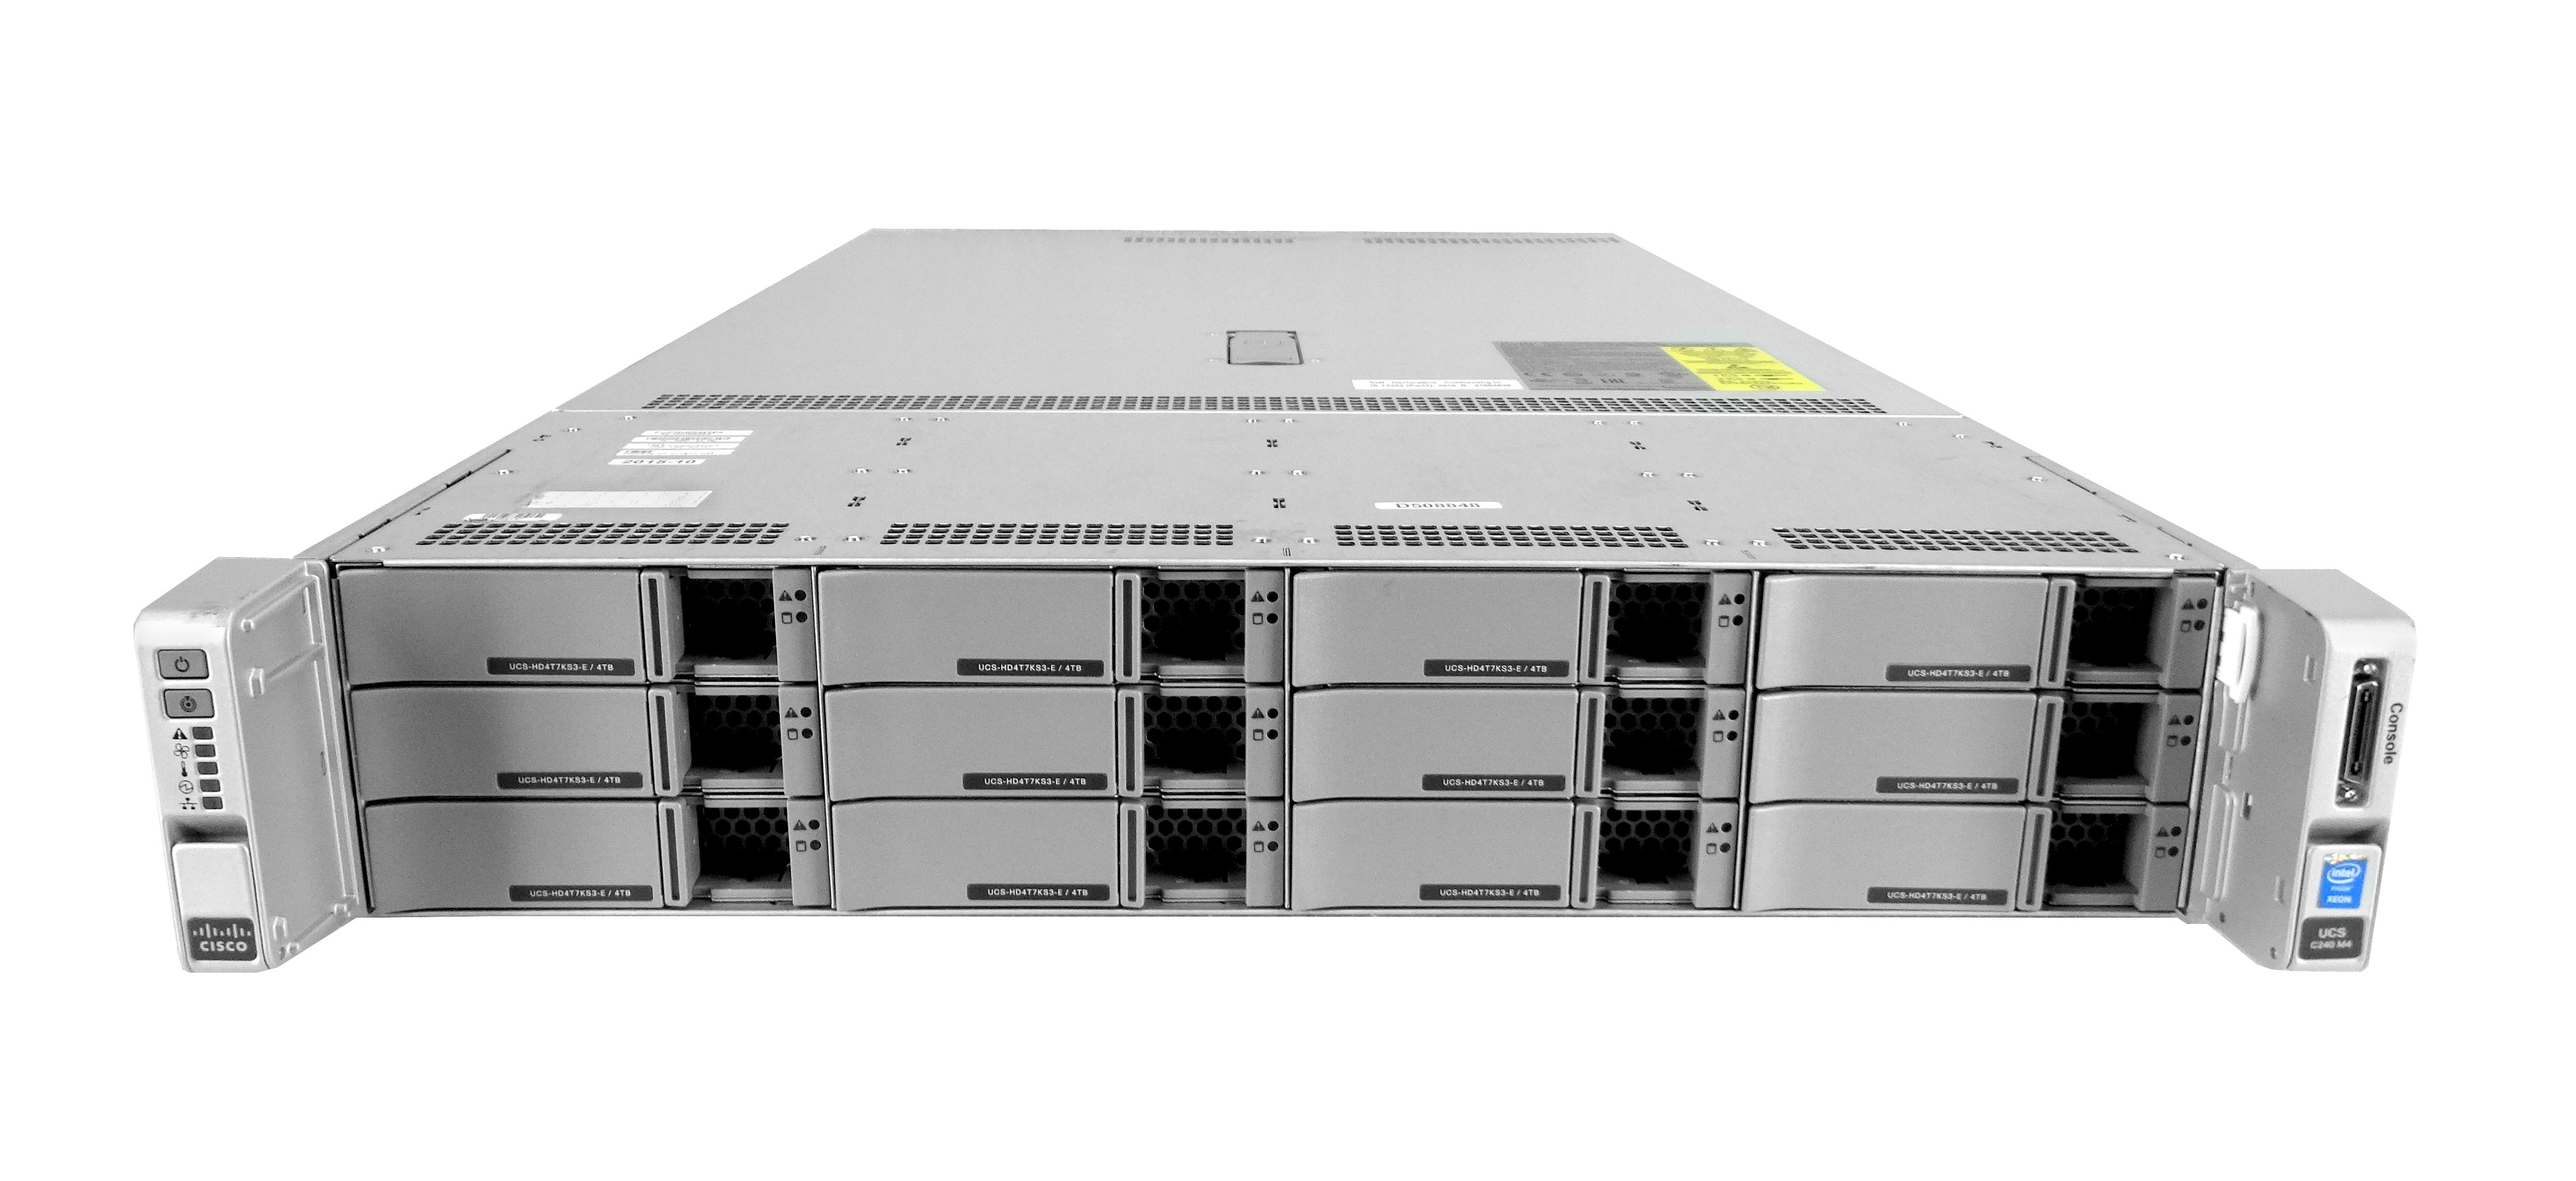 Cisco UCS C240 M4 front